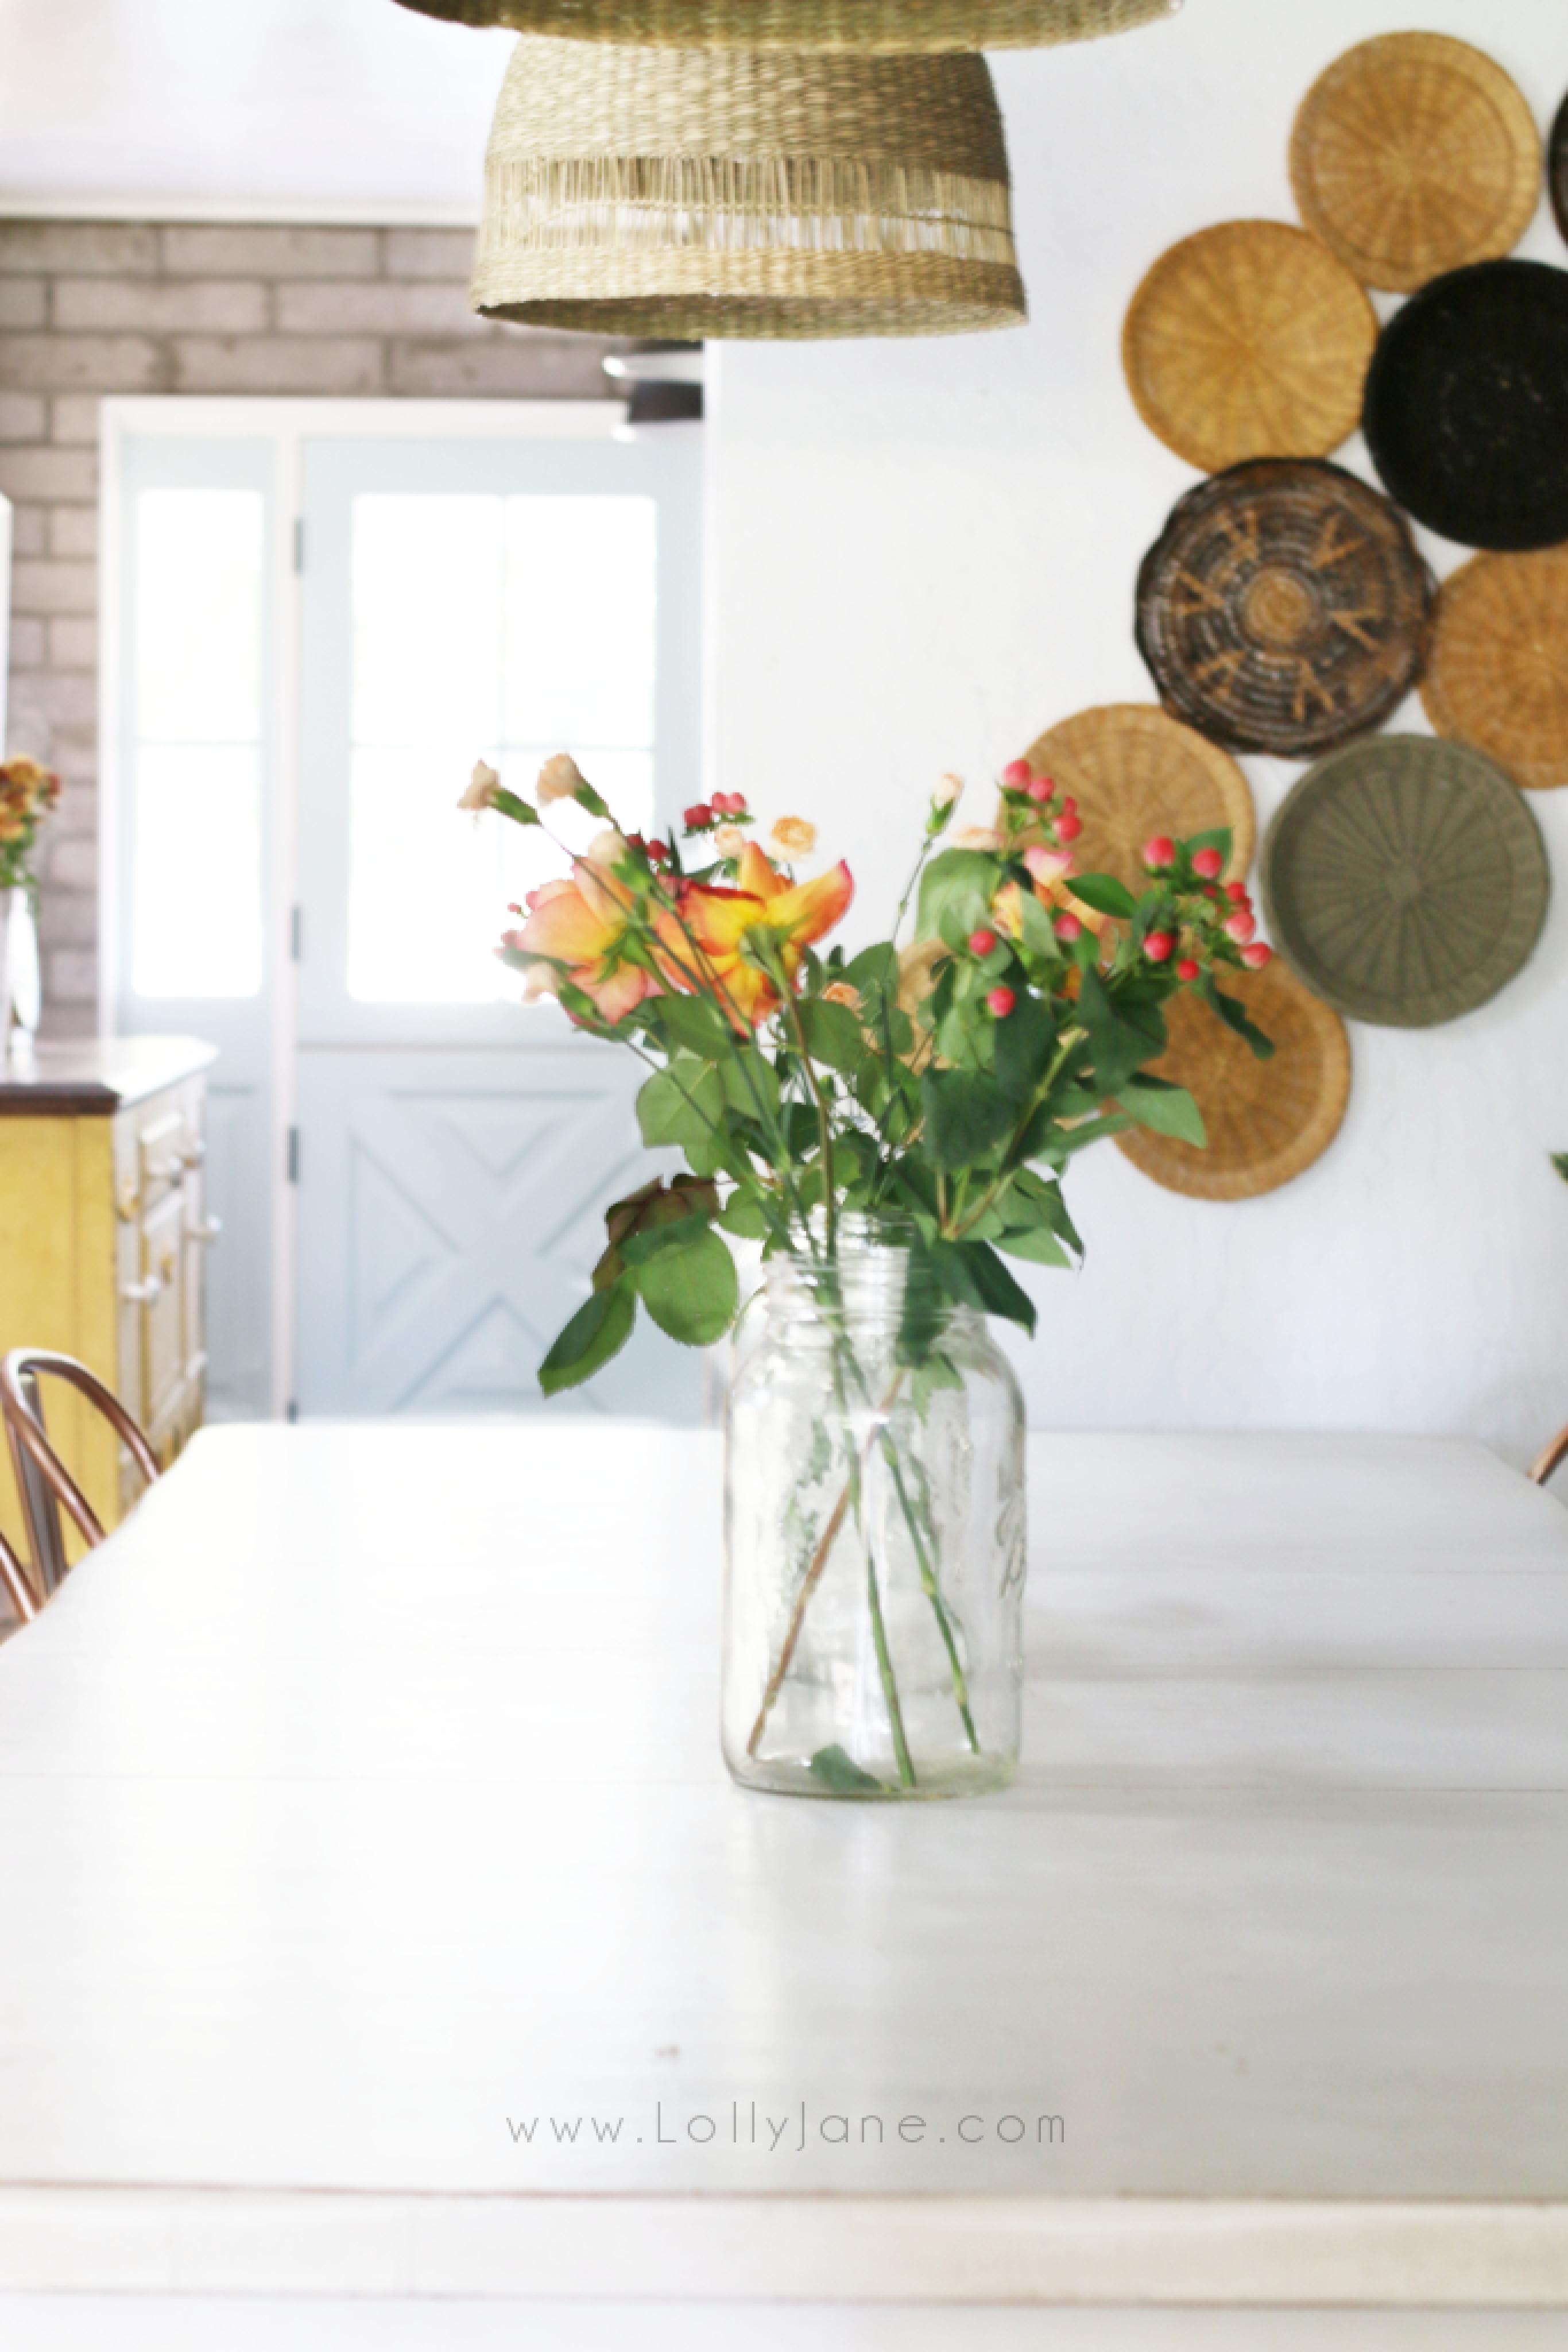 How to blend boho to farmhouse style decor. Love how cozy farmhouse house but the fun trend of boho decor? We've got some tips to marry the two styles! #farmhousebohodecor #bohofarmhousedecor #howtostylebohodecor #modernfarmhouse #basketwallidea #basketpendants